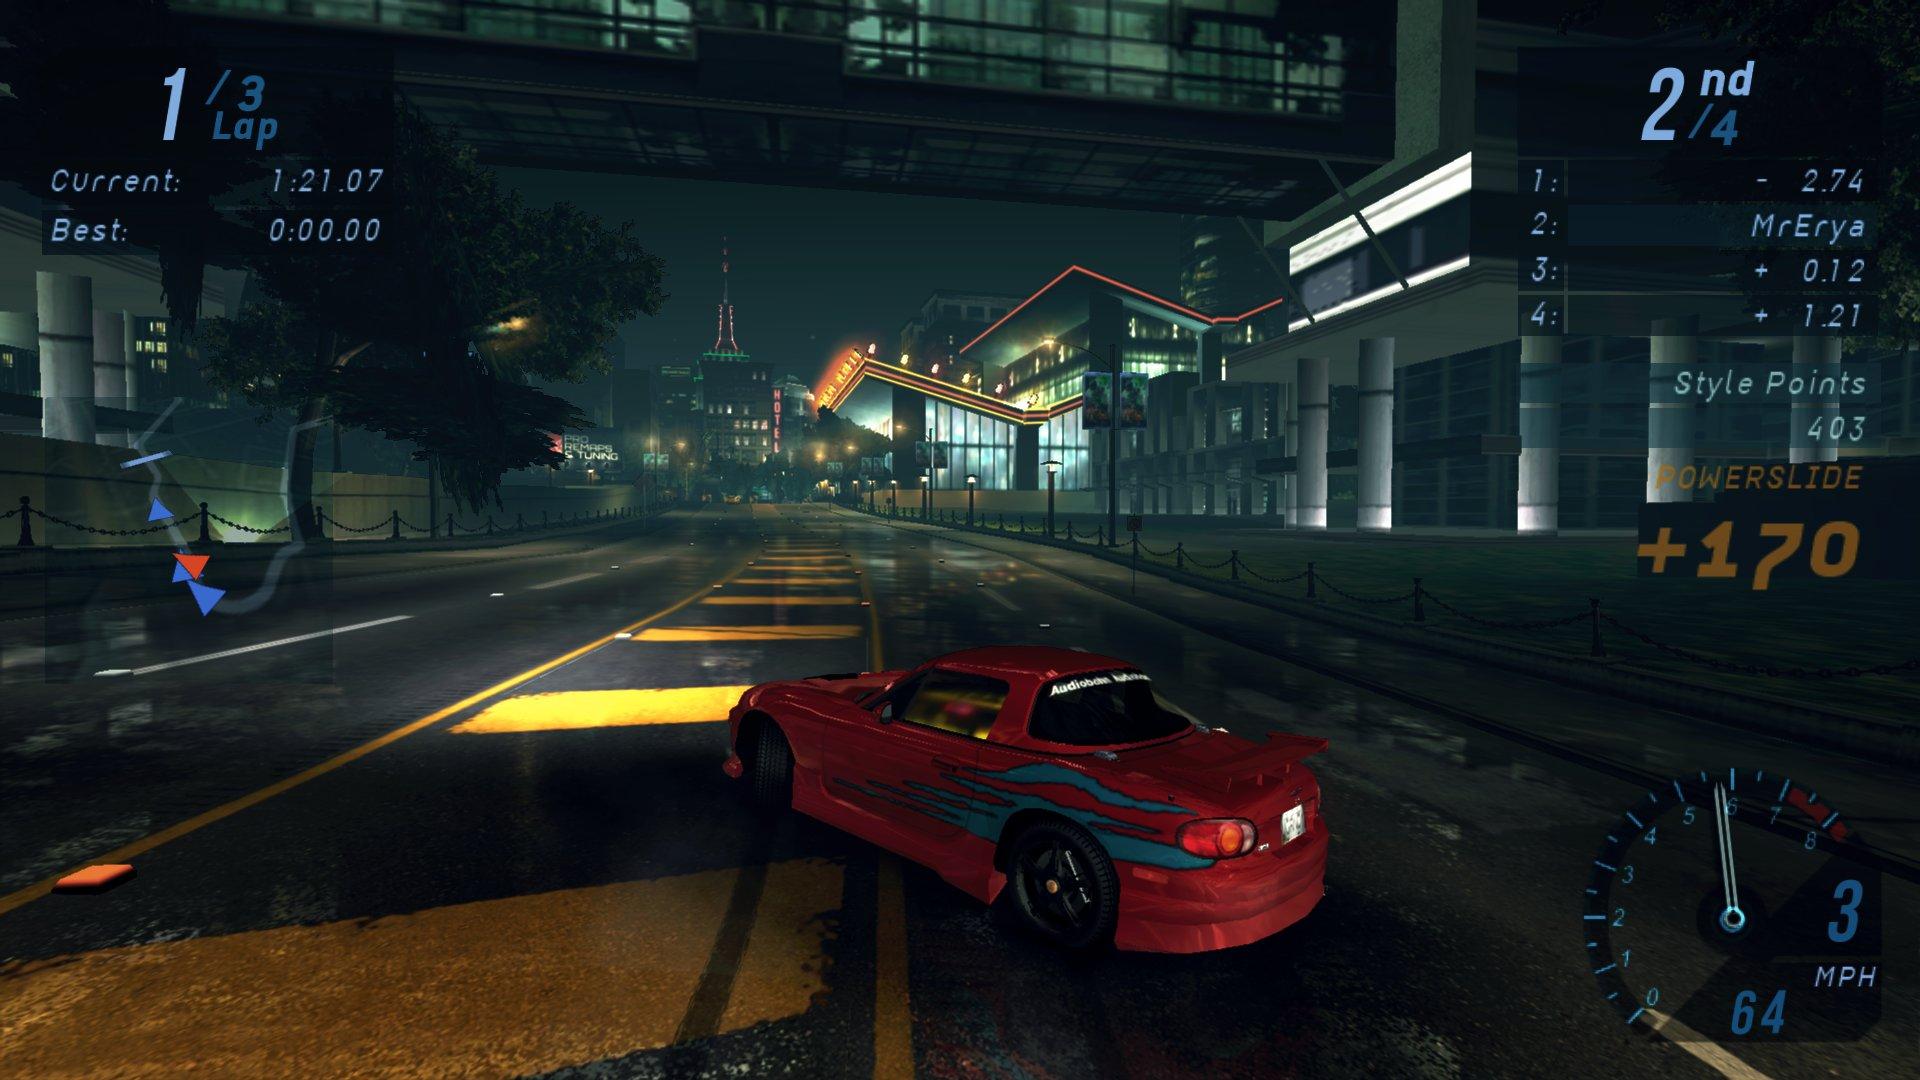 NFS: Underground: Redux Mod для Другие игры - Скриншот 3